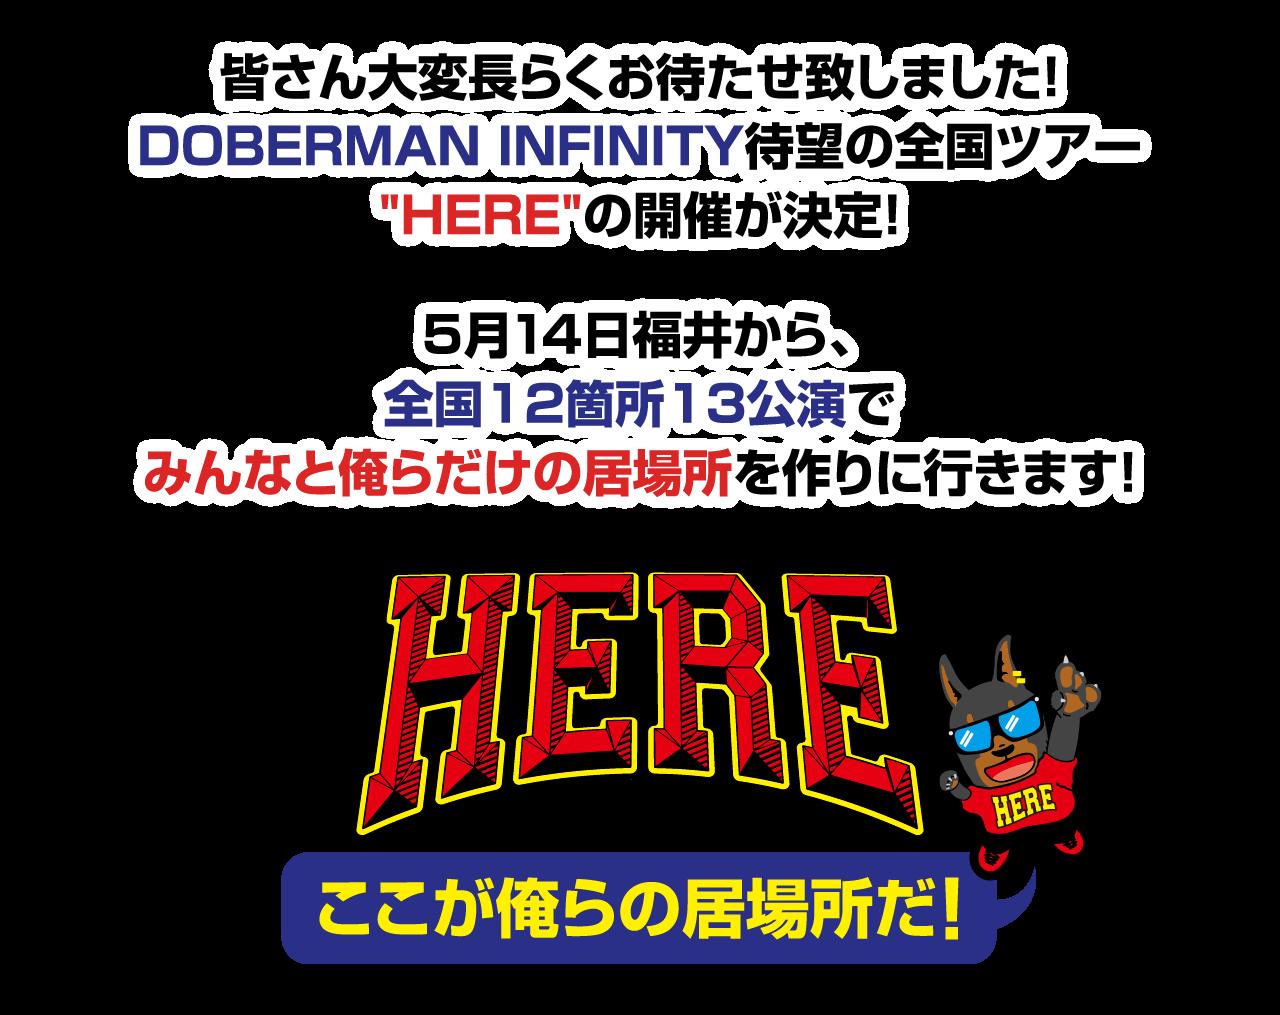 header_text